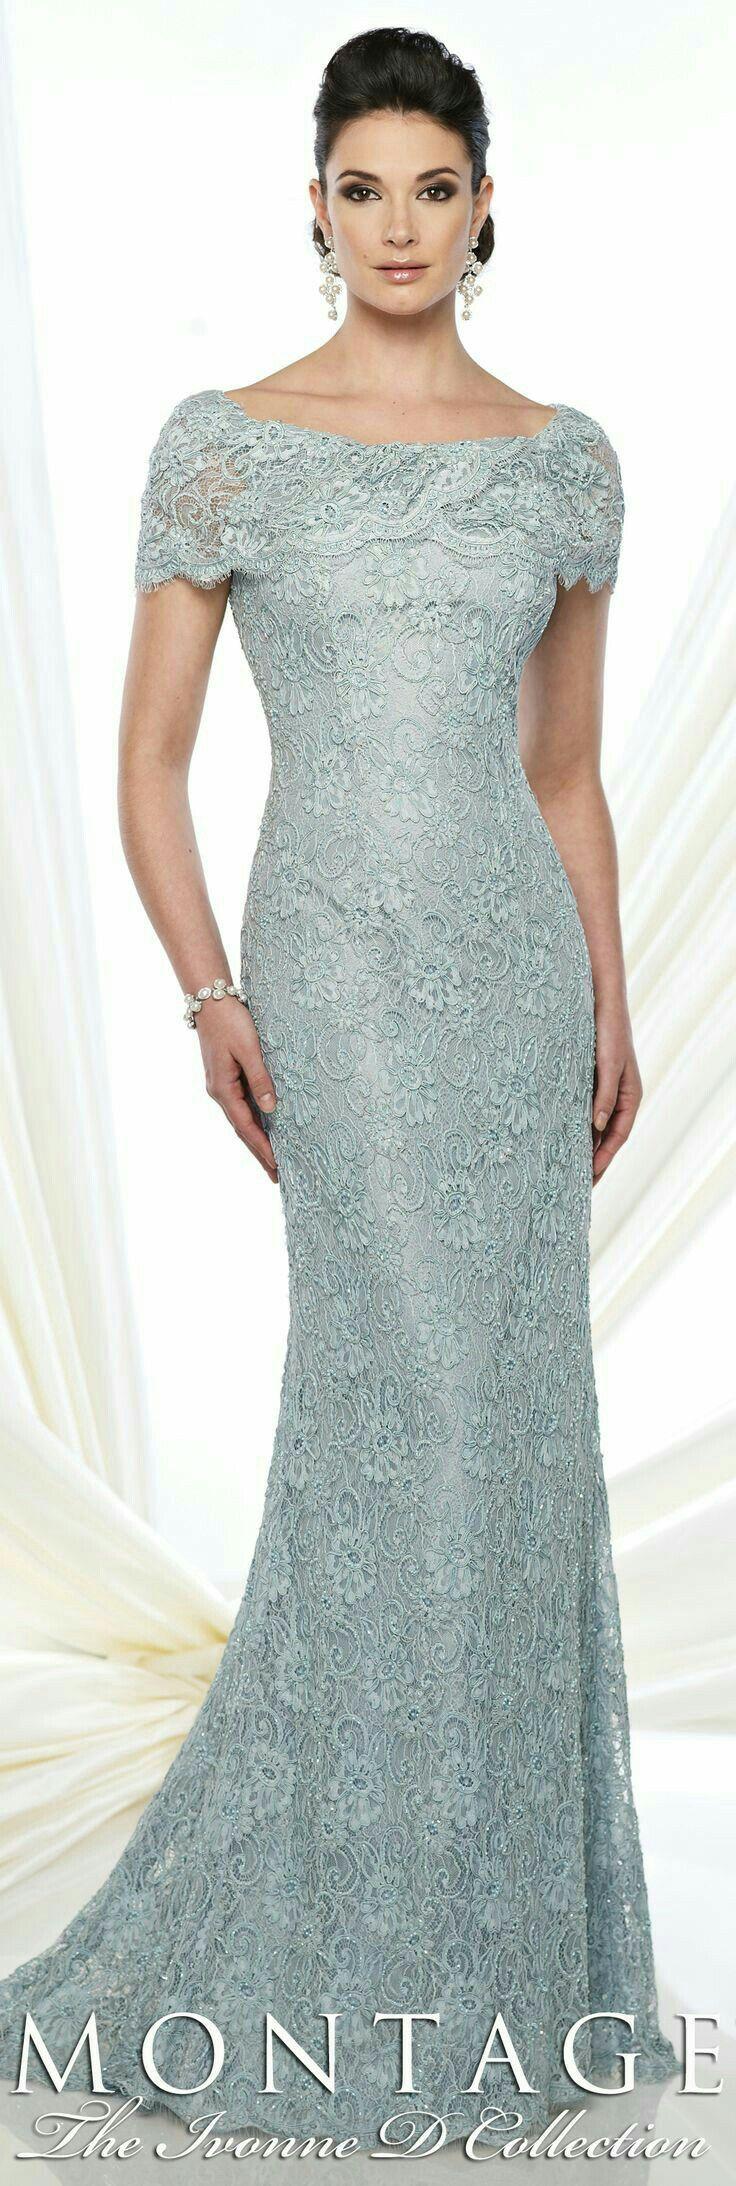 Pin by betty garnica on vestidos | Pinterest | Google, Bride dresses ...